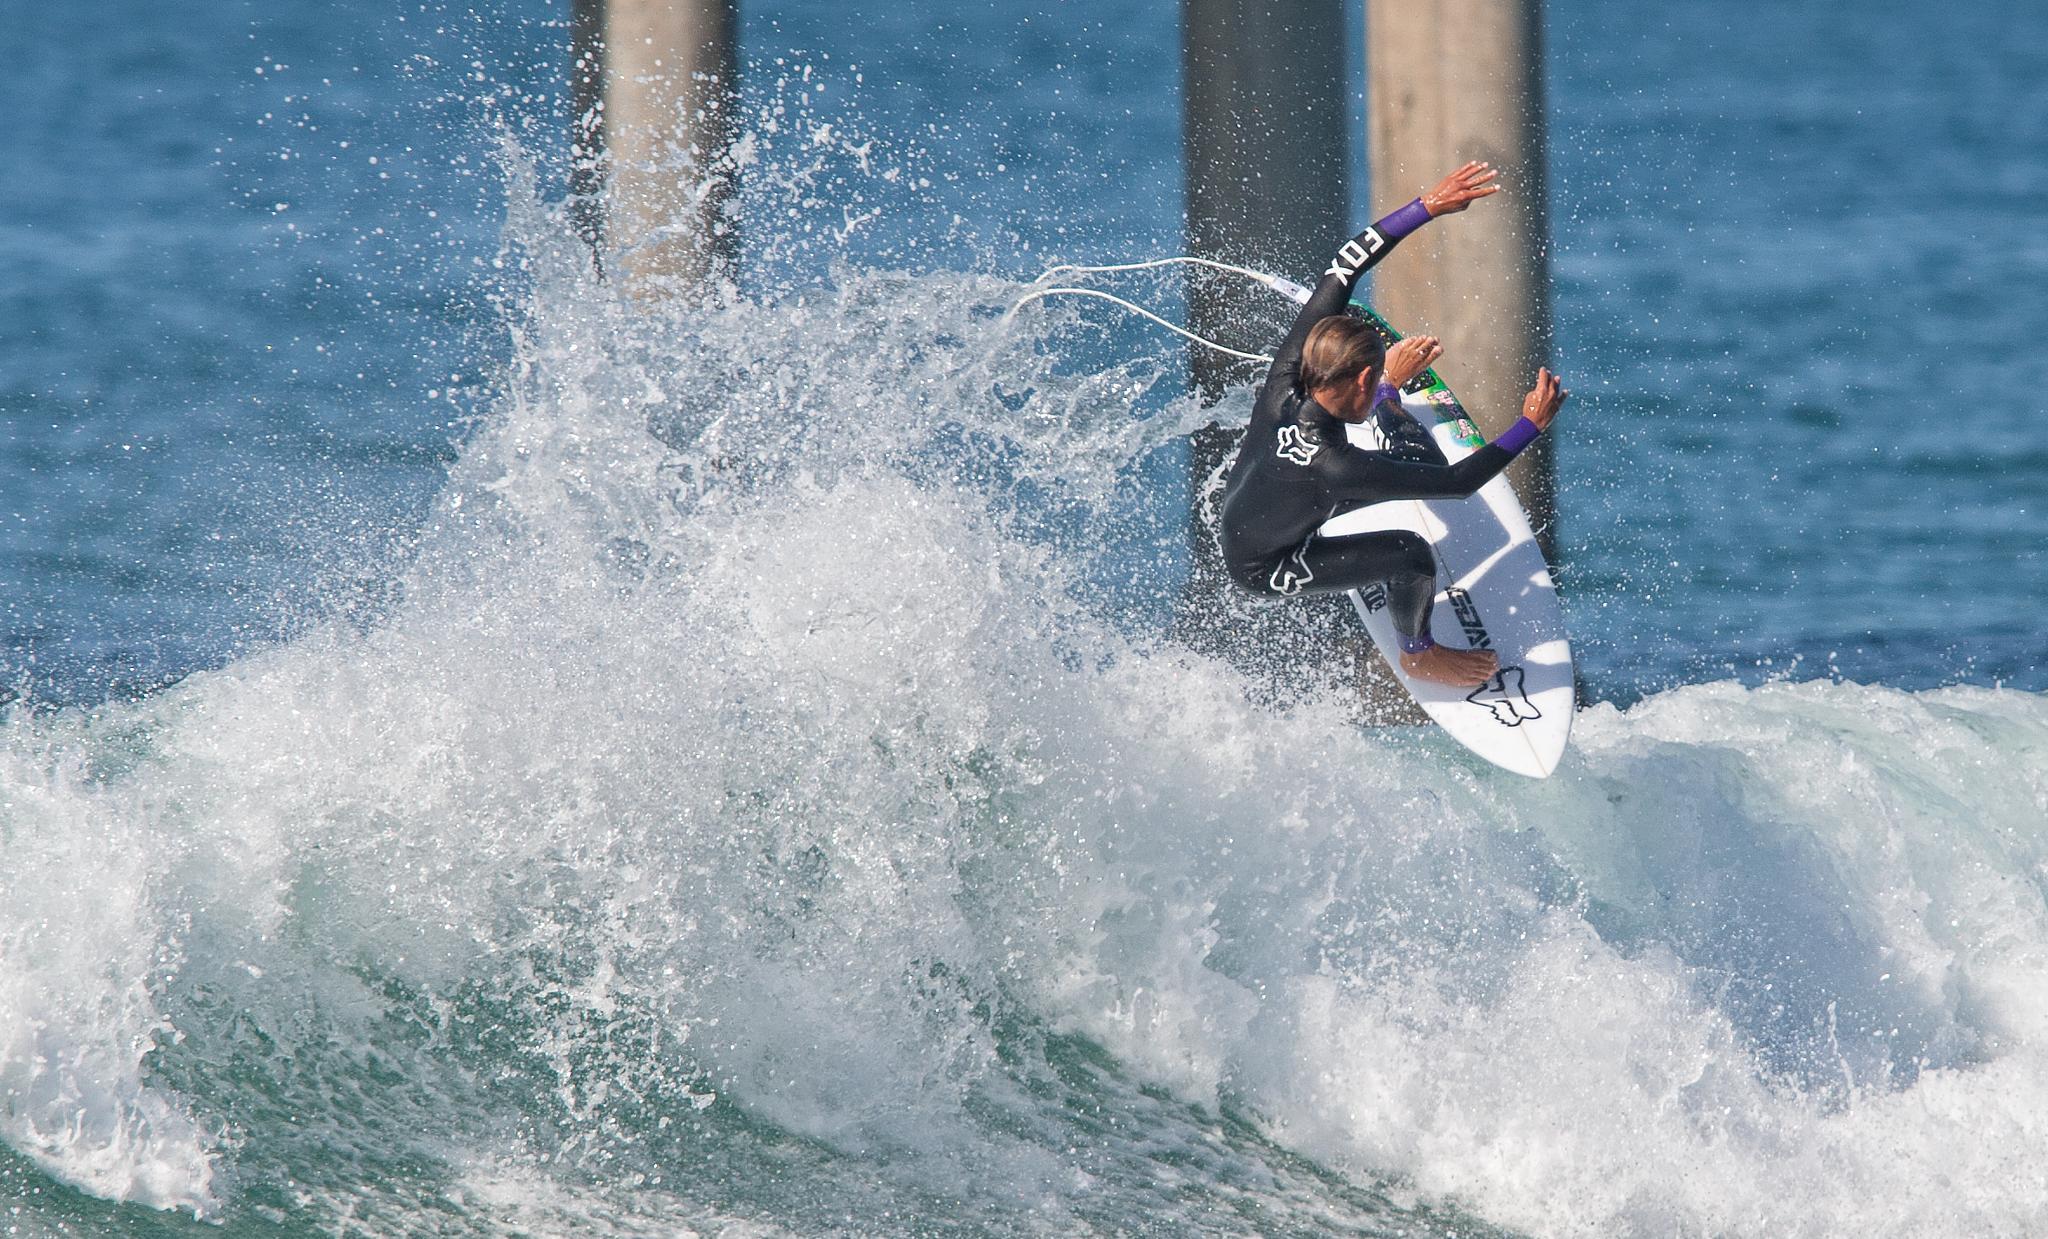 Gunner Day Huntington Beach Southside 03.08.2015 by blueskyoveraquatic